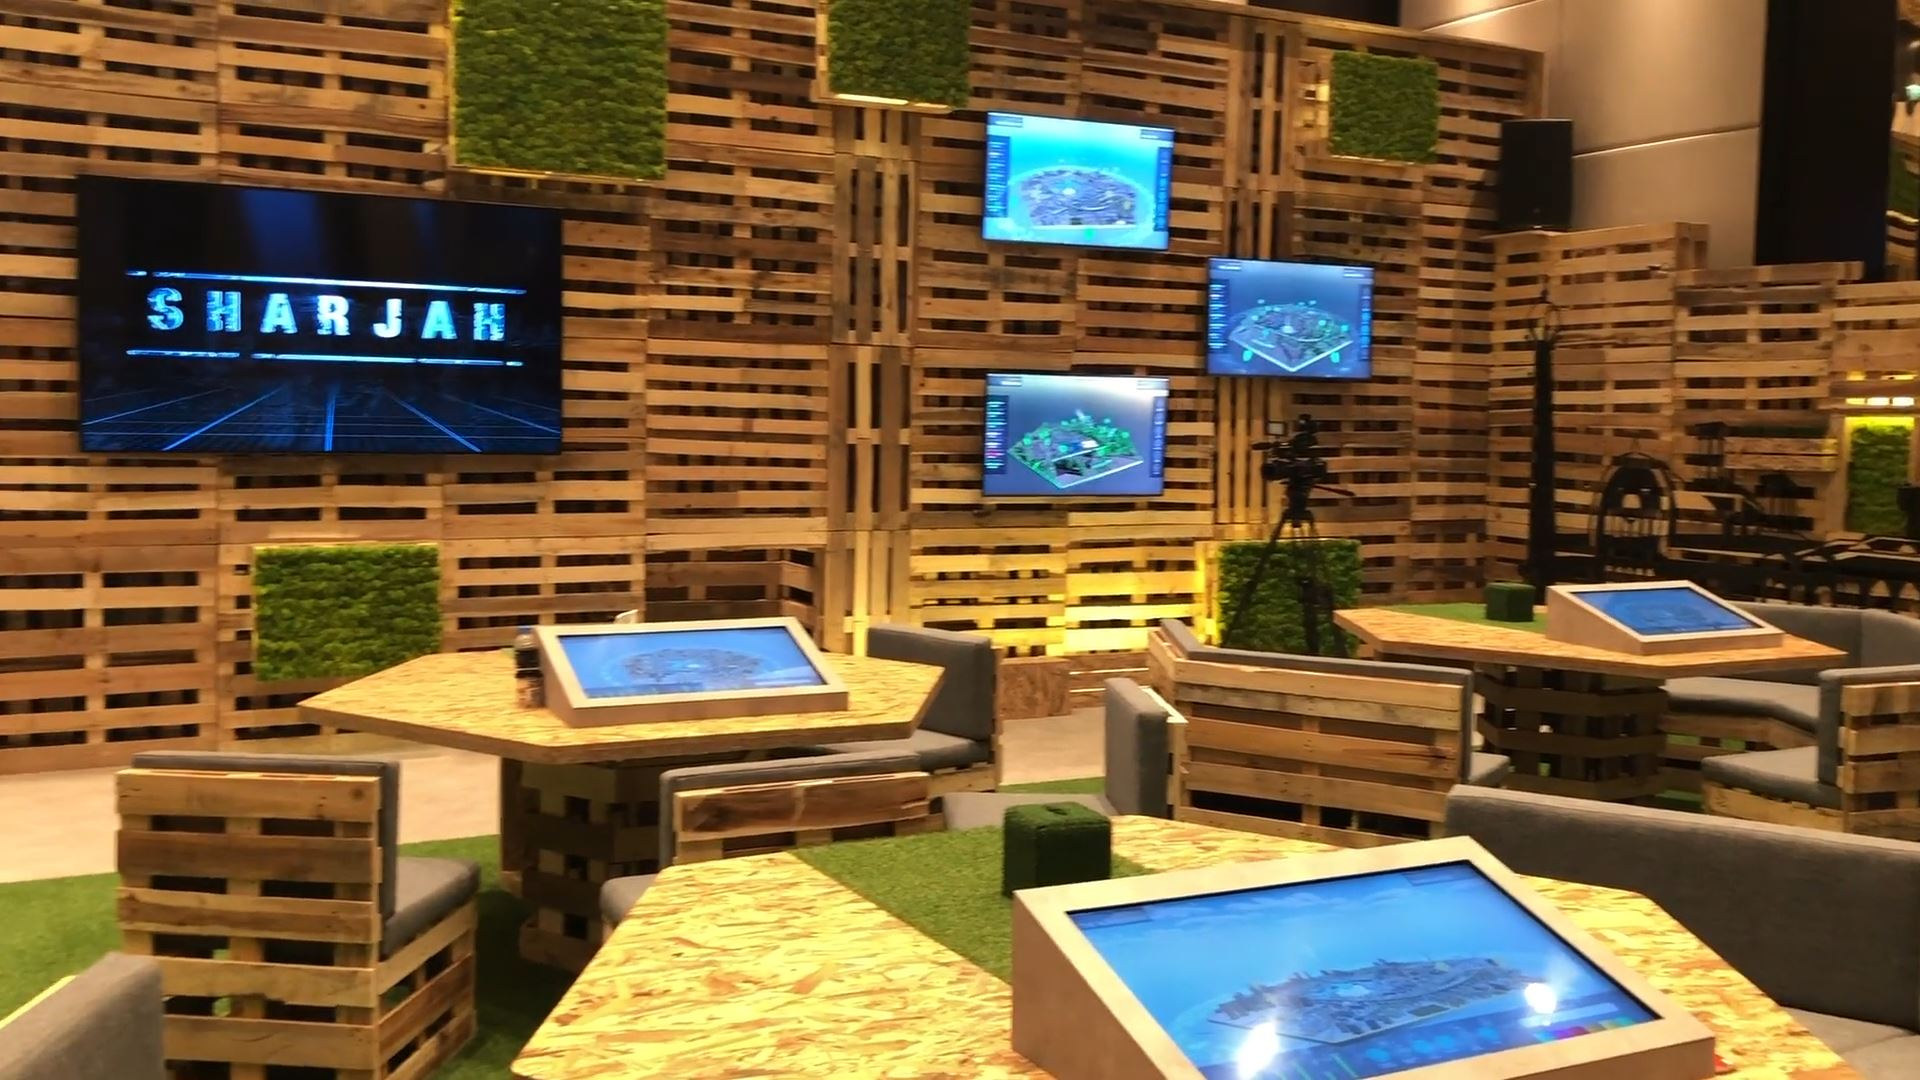 sharjah e-Government retreat interactive technology integration room